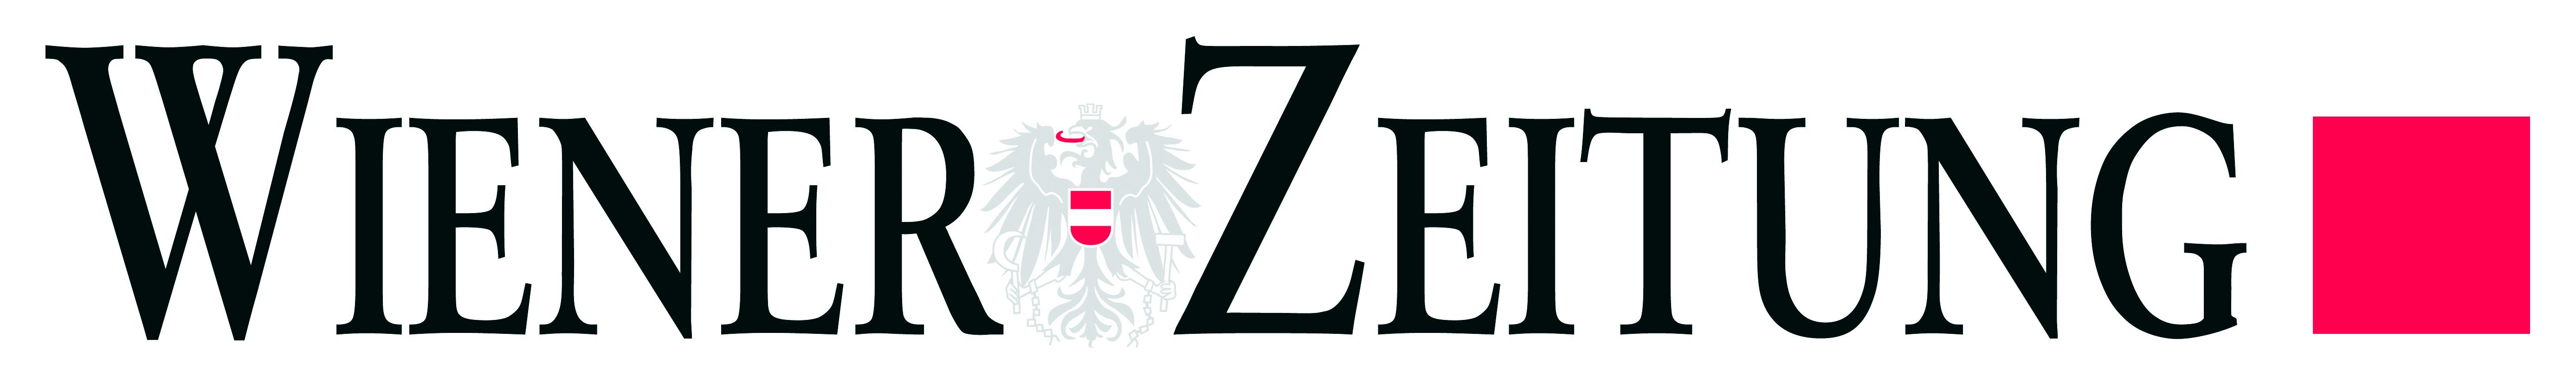 Wiener Zeitung GmbH